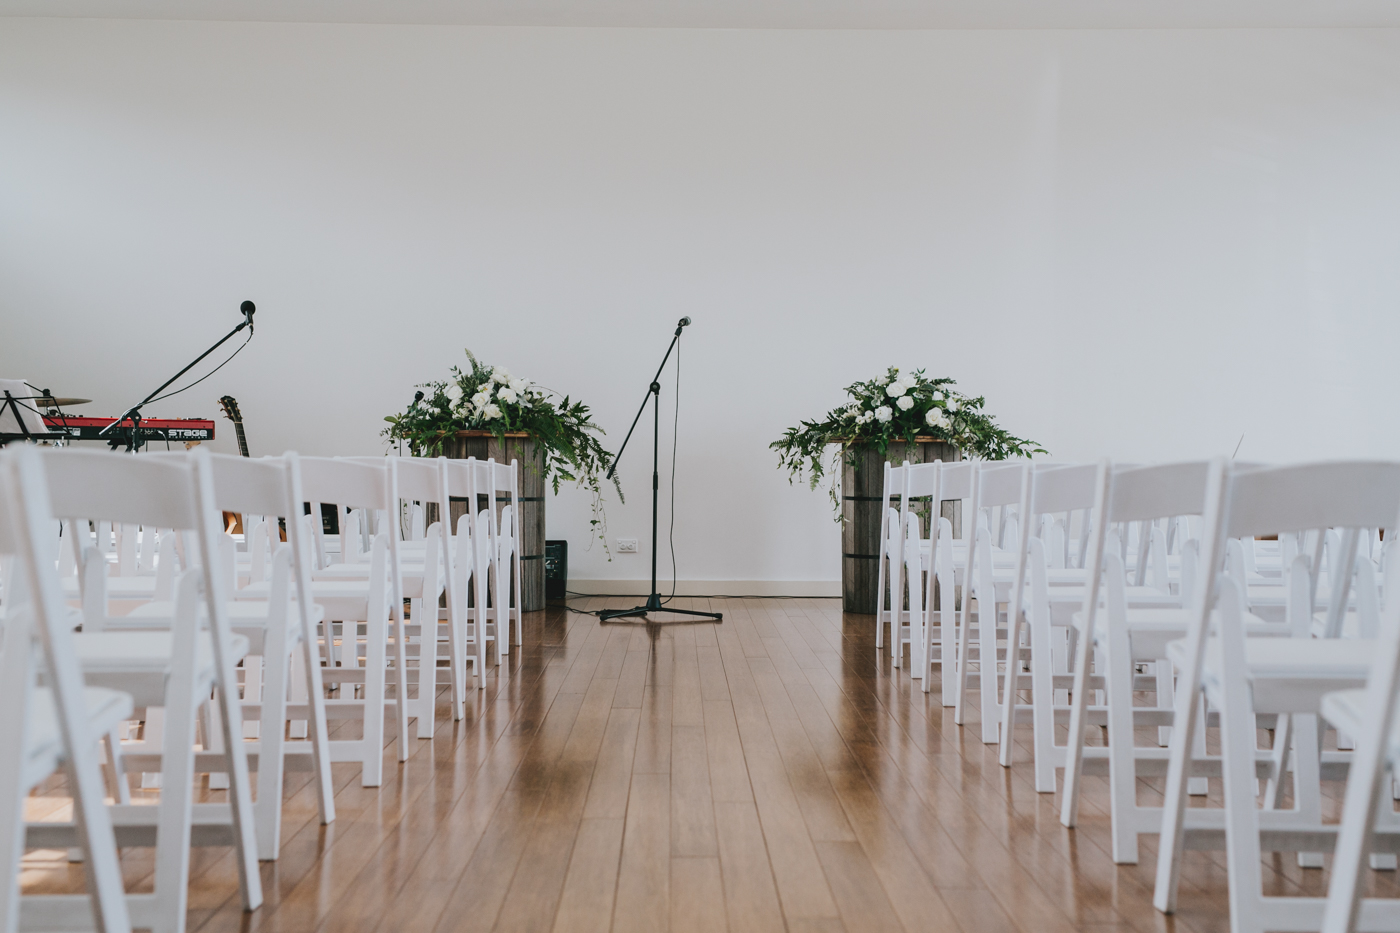 Rachel & Jacob - Willow Farm Berry - South Coast Wedding - Samantha Heather Photography-58.jpg